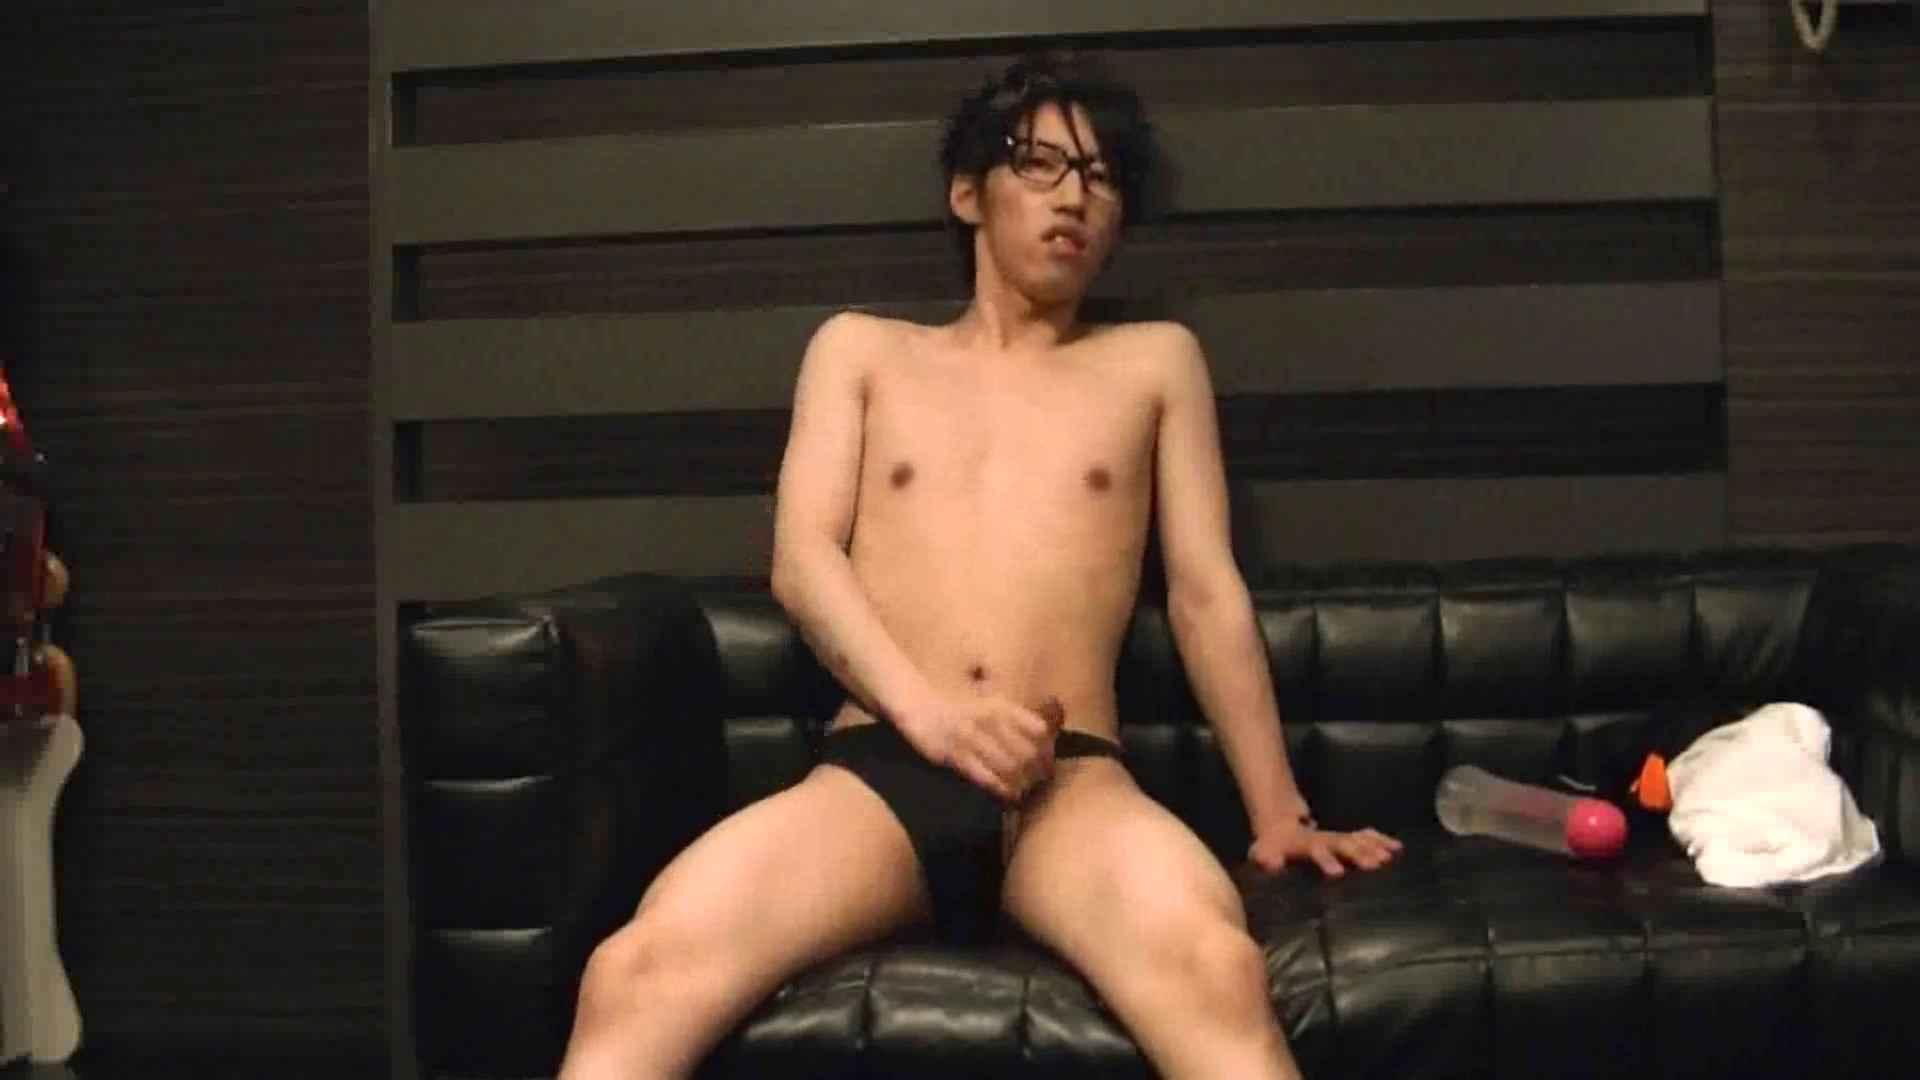 ONA見せカーニバル!! Vol3 男・男 ゲイ無料無修正画像 72pic 45